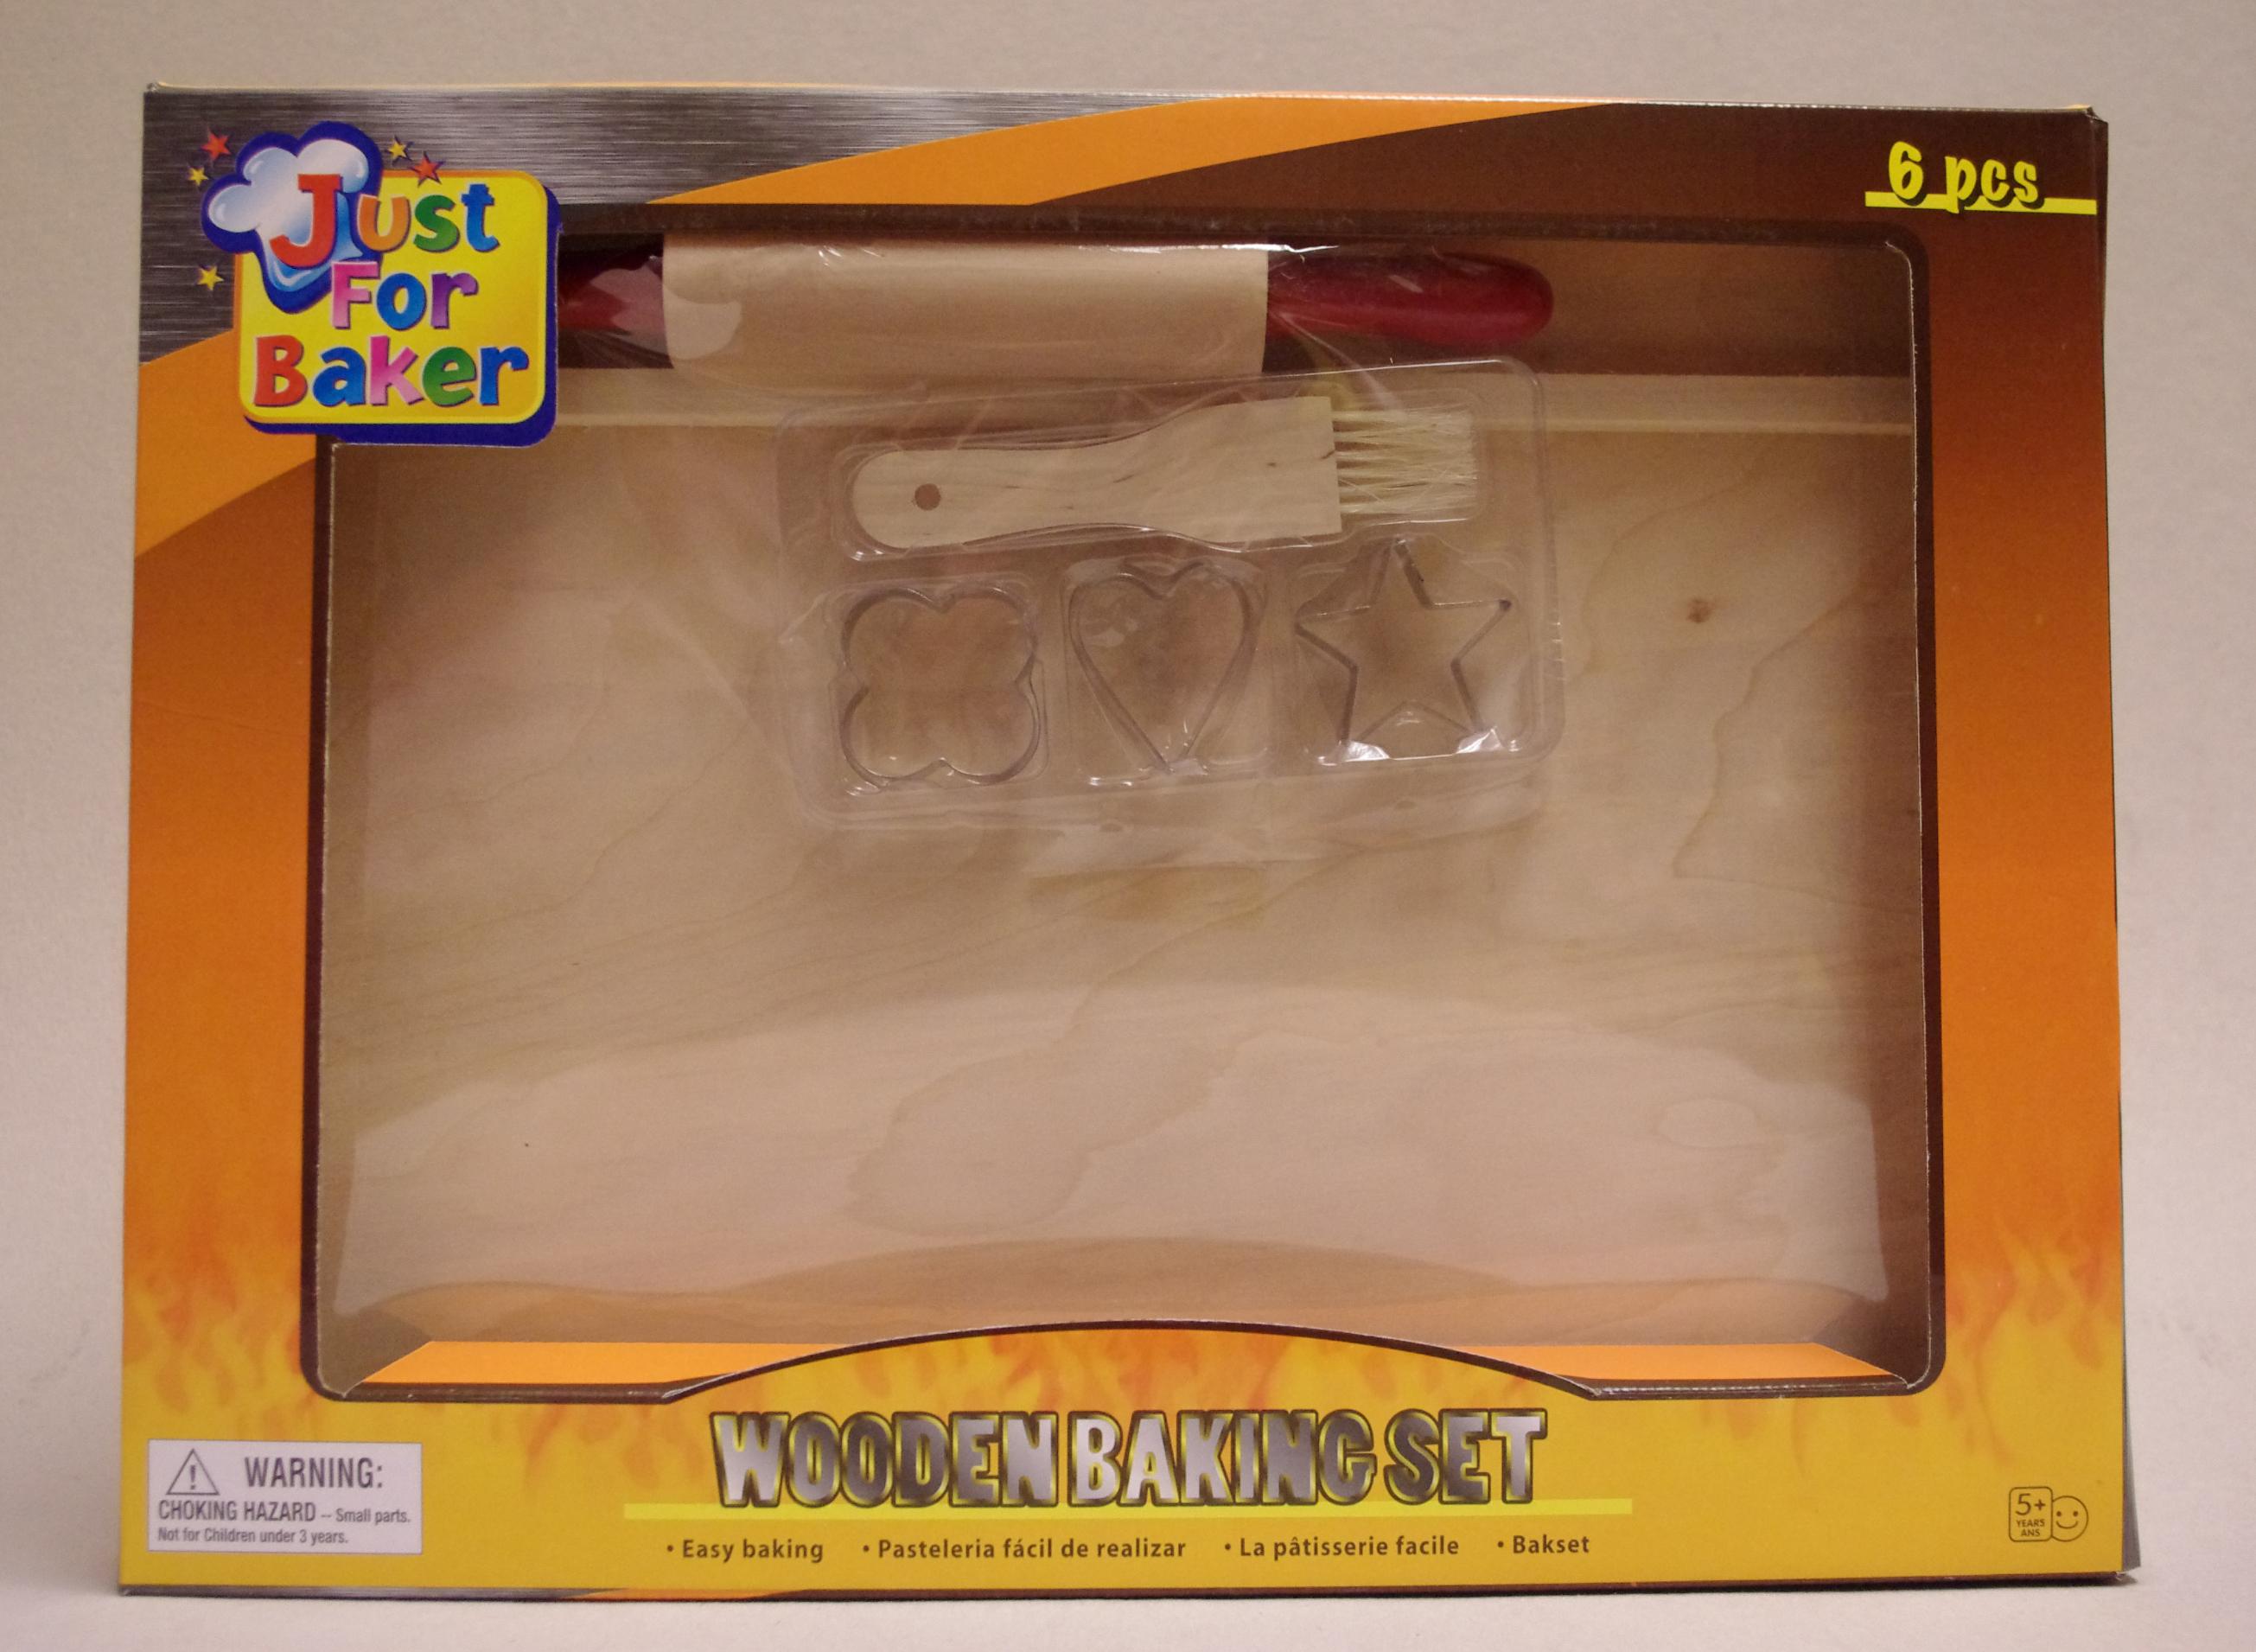 Koket For Barn : Bakbord i tro med tillbehor  Billiga leksaker online  LekOutlet